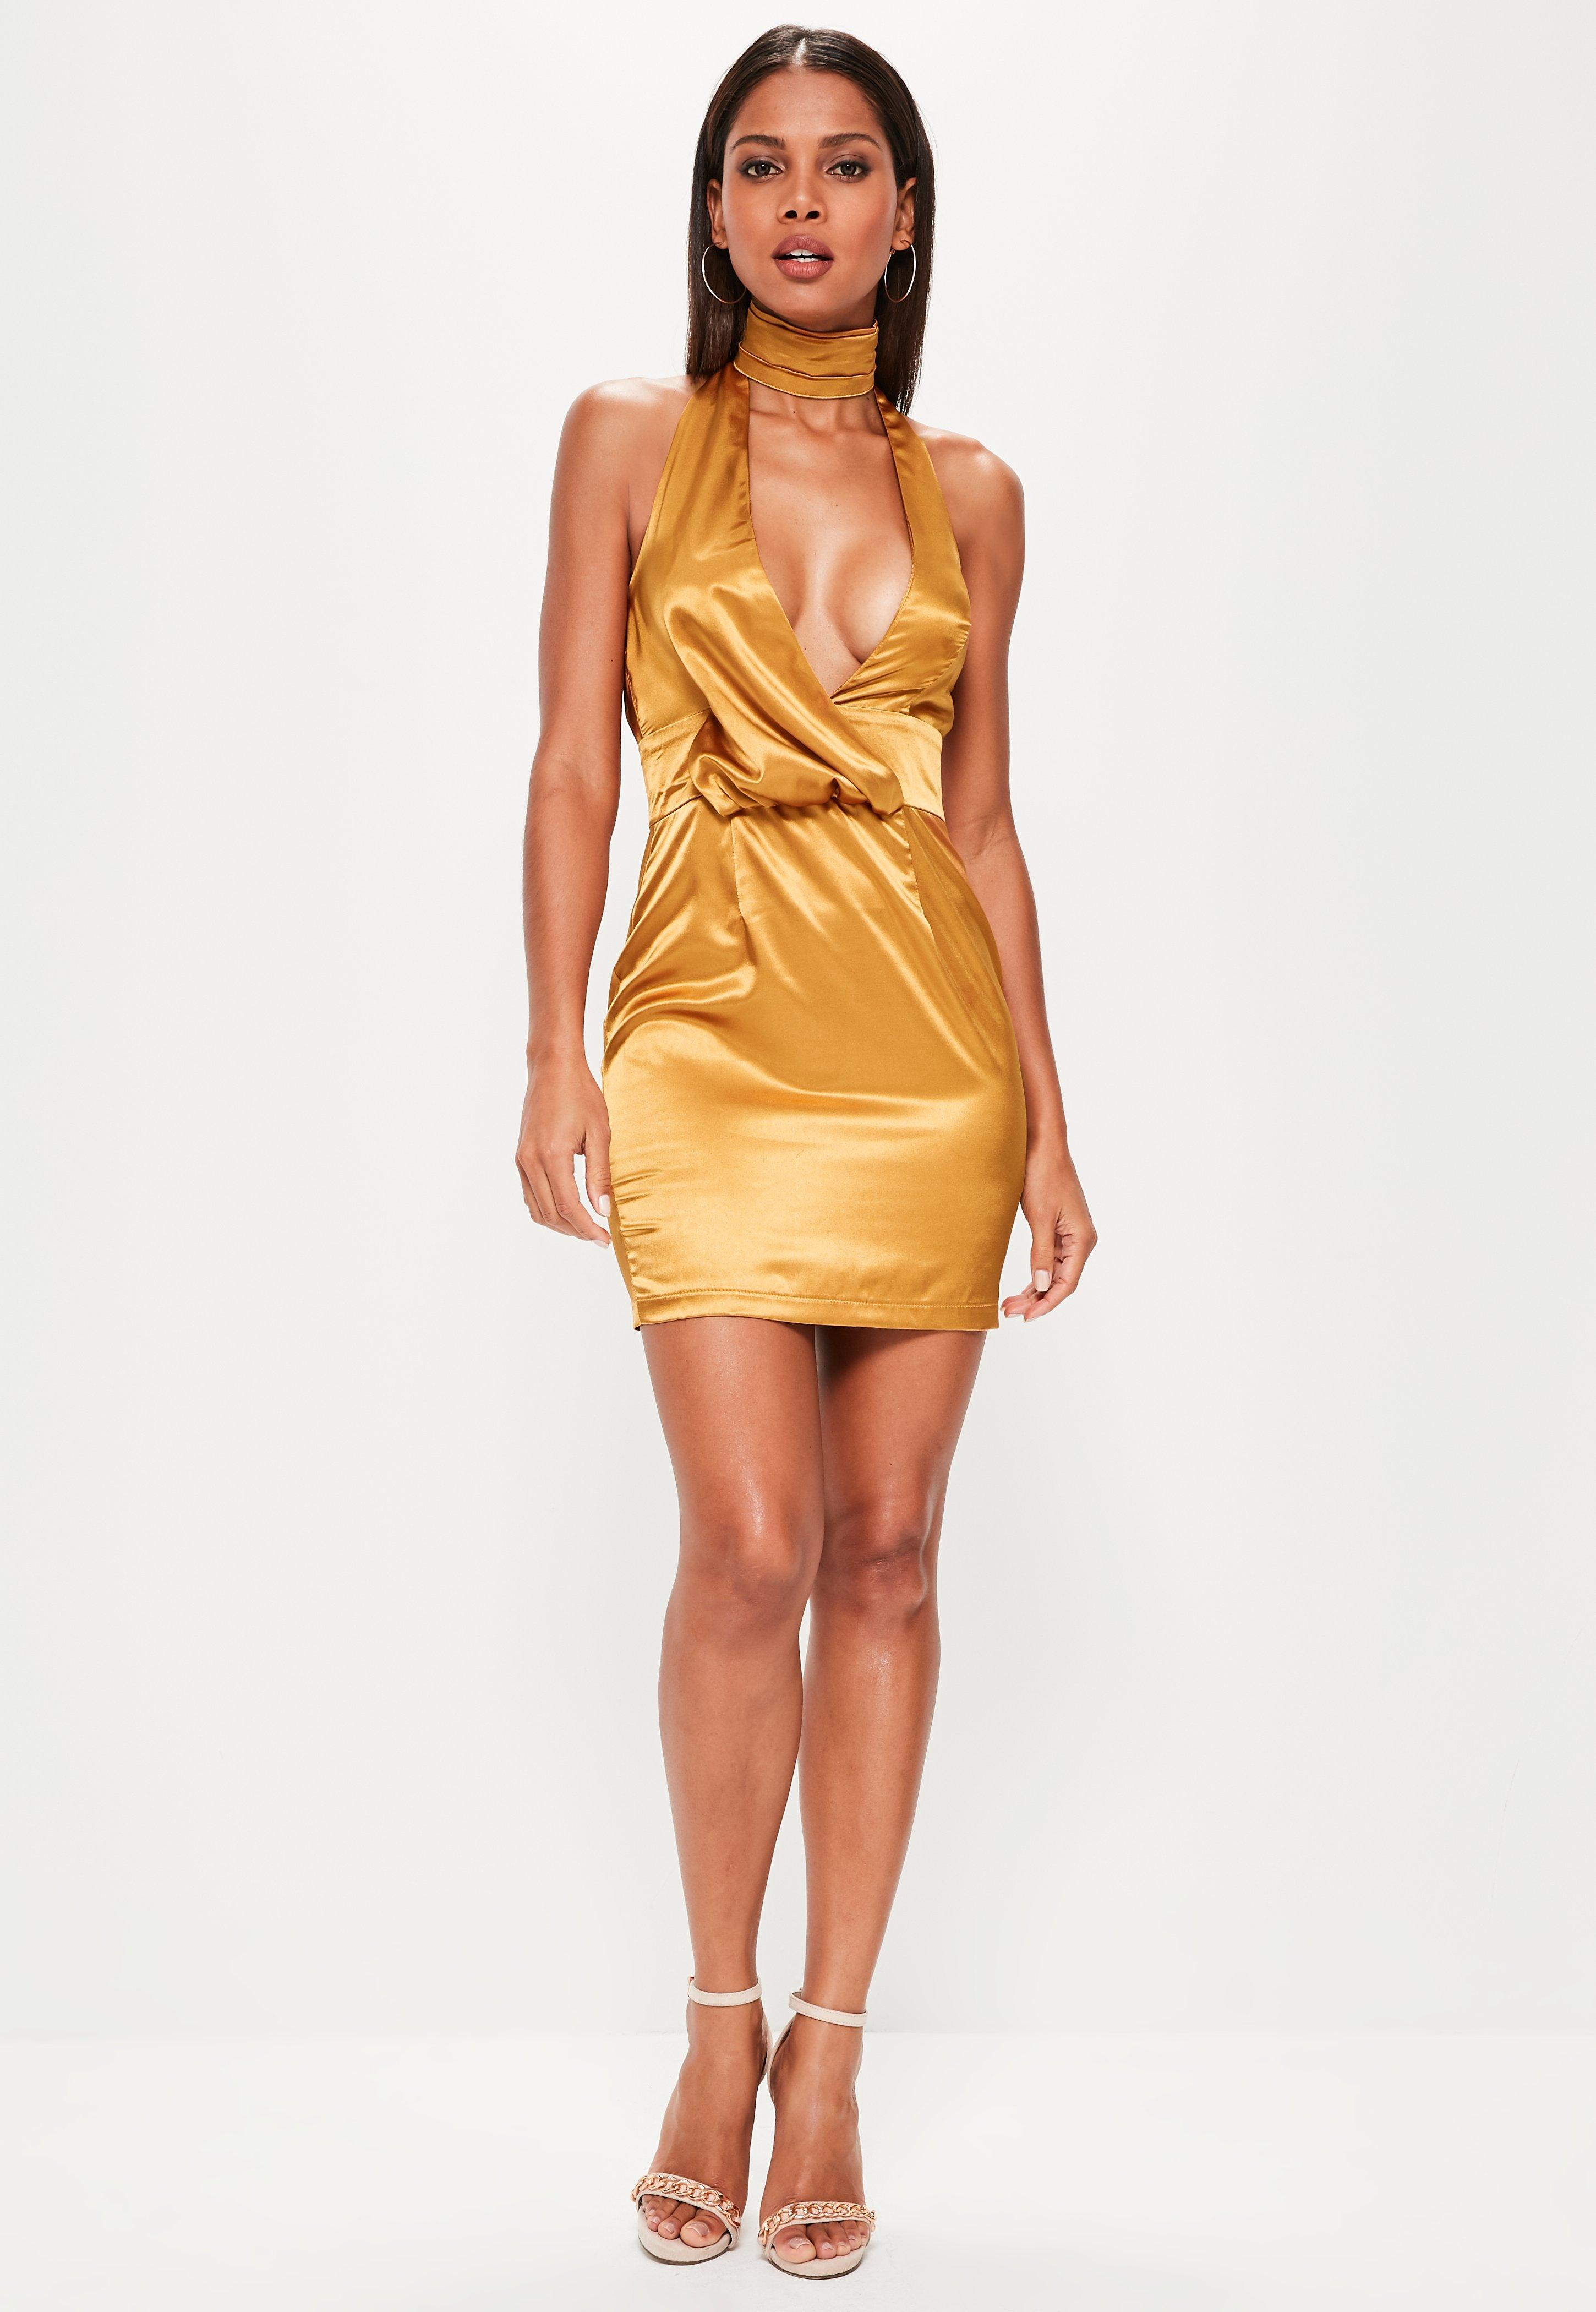 Lyst - Missguided Gold Silky Drape Choker Shift Dress in Metallic ab31da08e